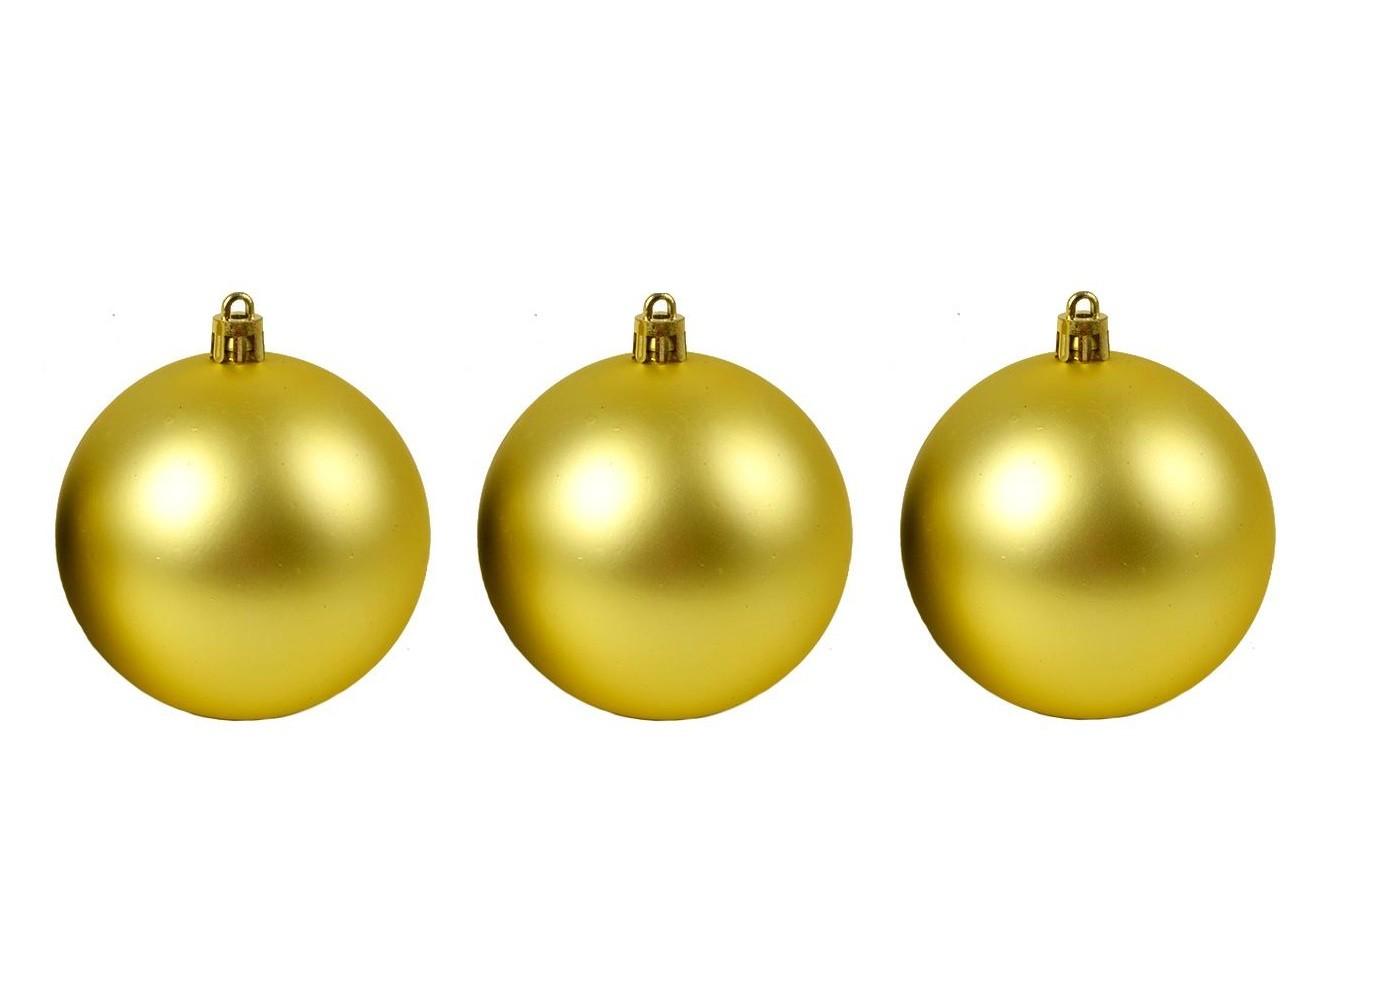 Bola de Natal Dourada Fosca N.6 C/3 pçs